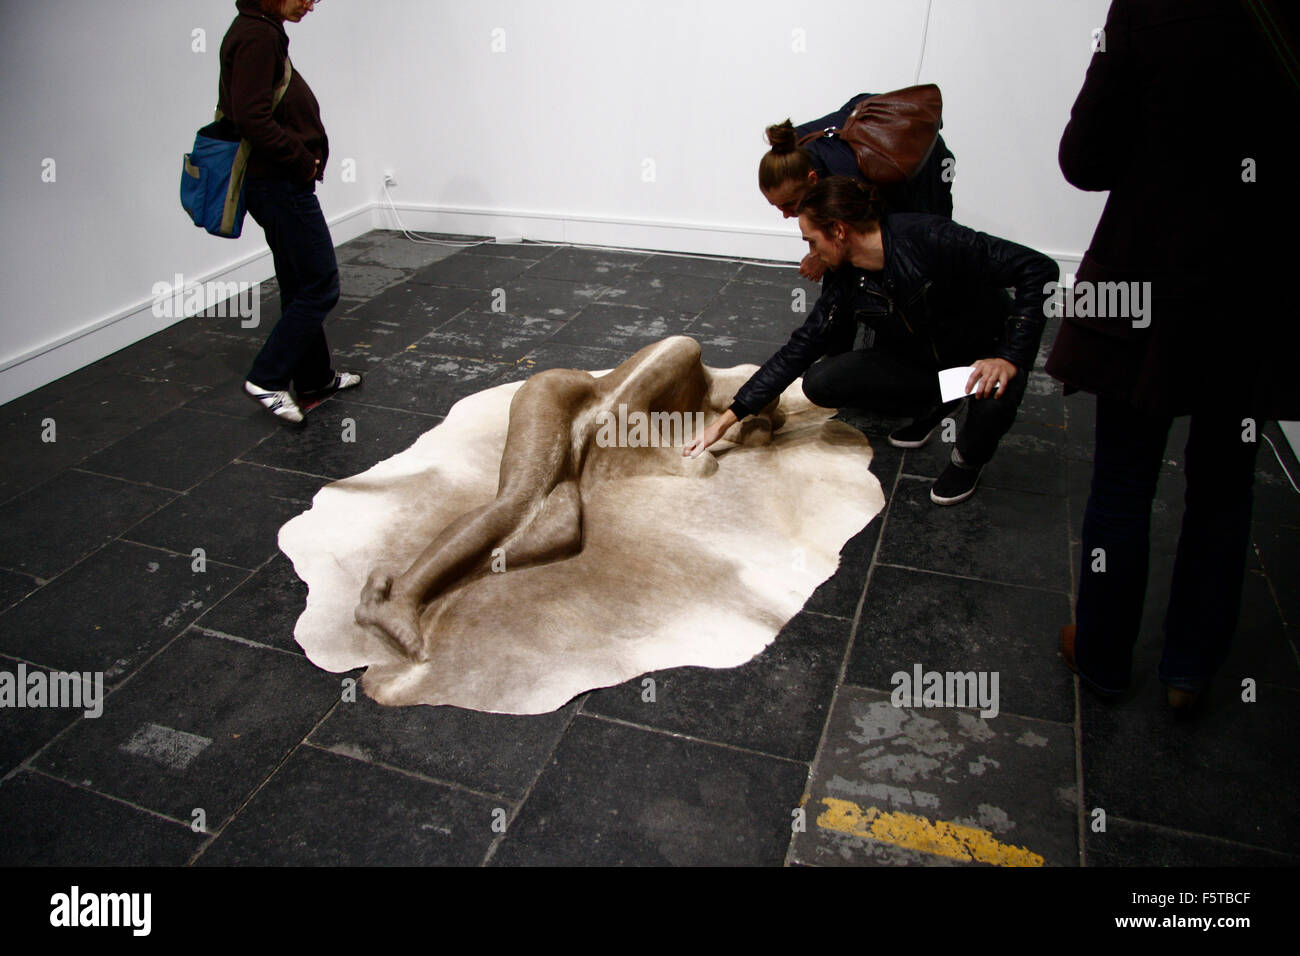 "Impressionen - Kunstmesse Fuer Zeitgenoessische Kunst ""Preview Berlin 08', Hangar 2, Flughafen Tempelhof, Stockbild"